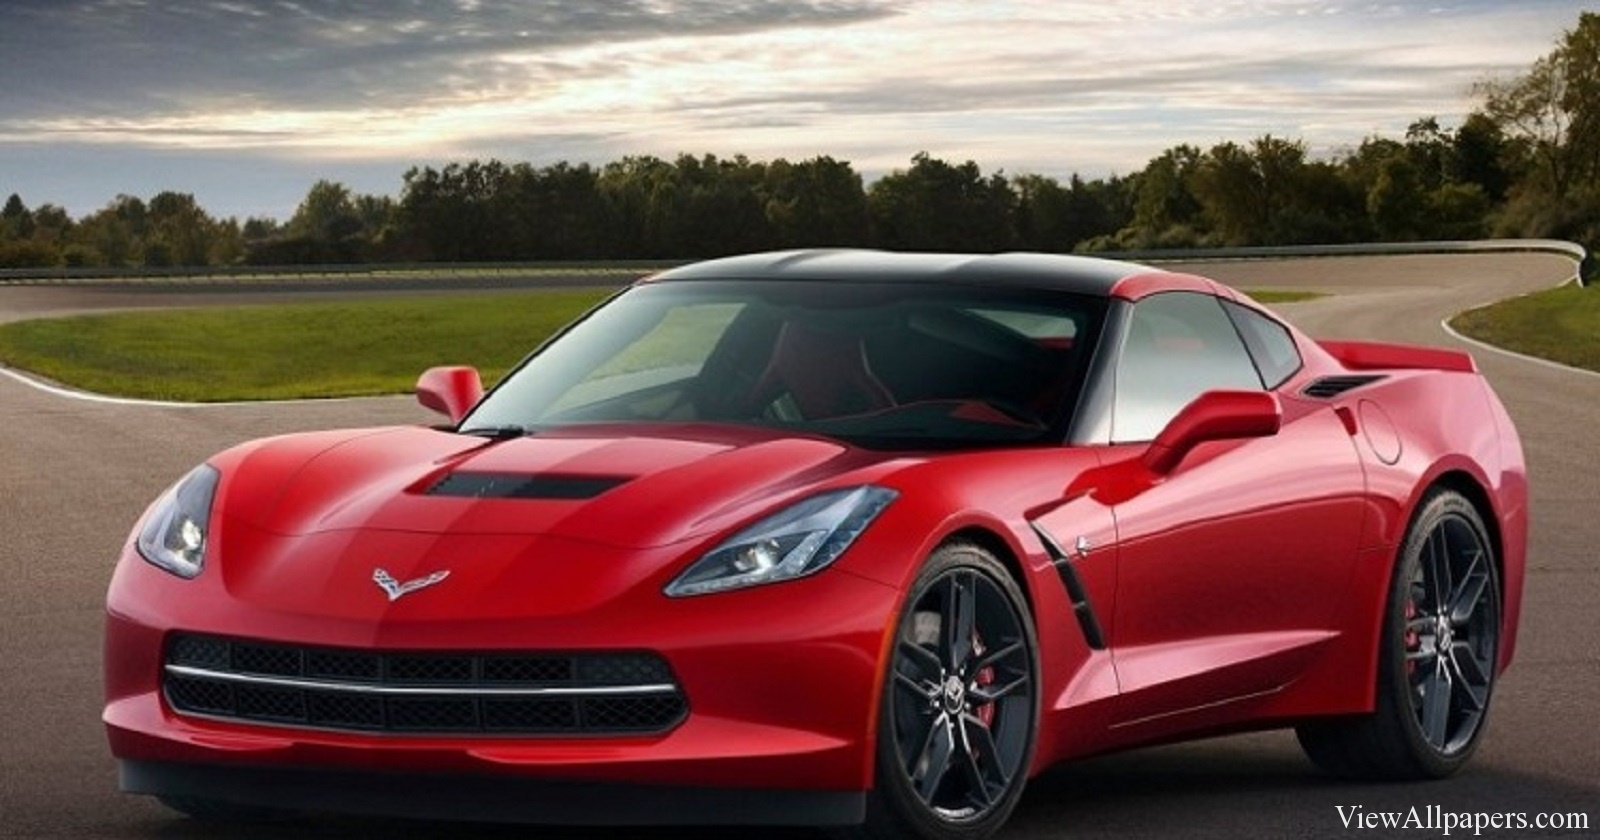 2016 Corvette Z07 High Resolution Wallpaper download 2016 1600x840